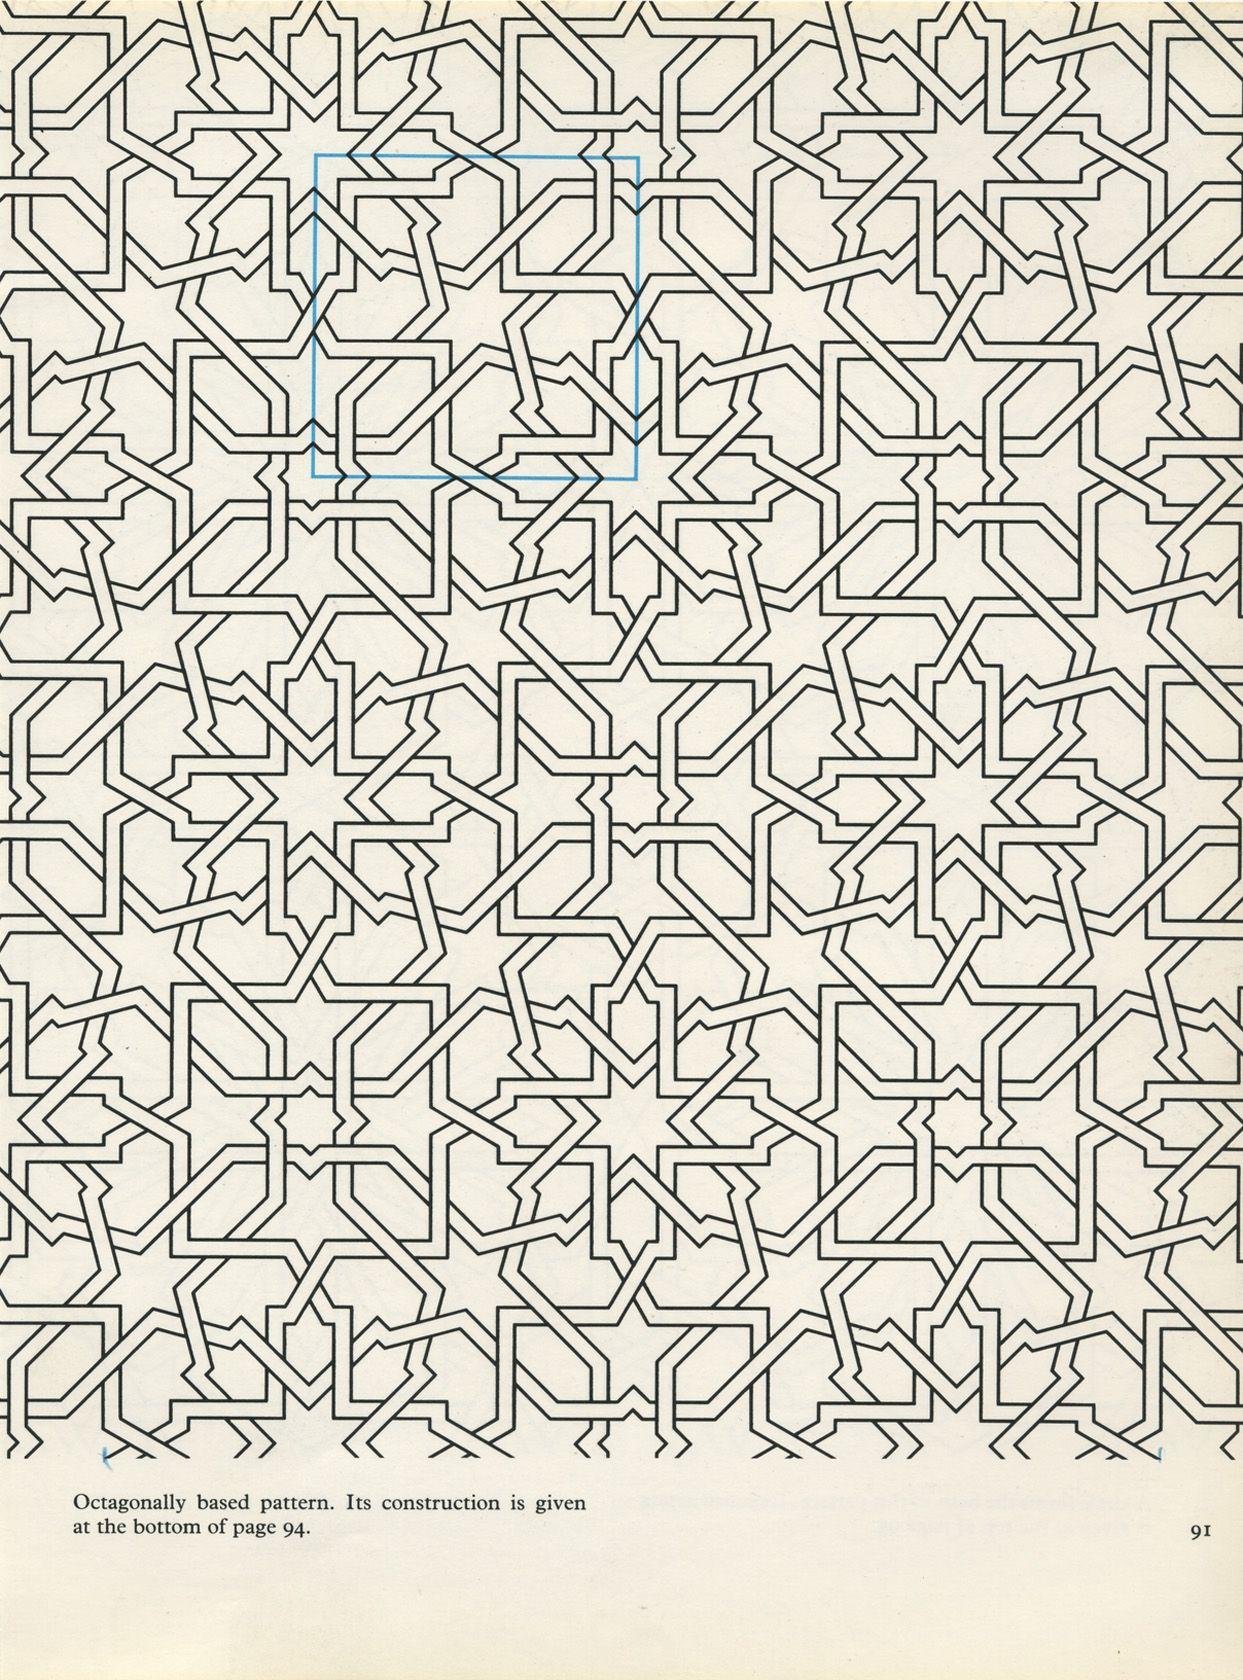 Middle Eastern Art Islamic Designs Acid Art Pia 091 (1243 1680)